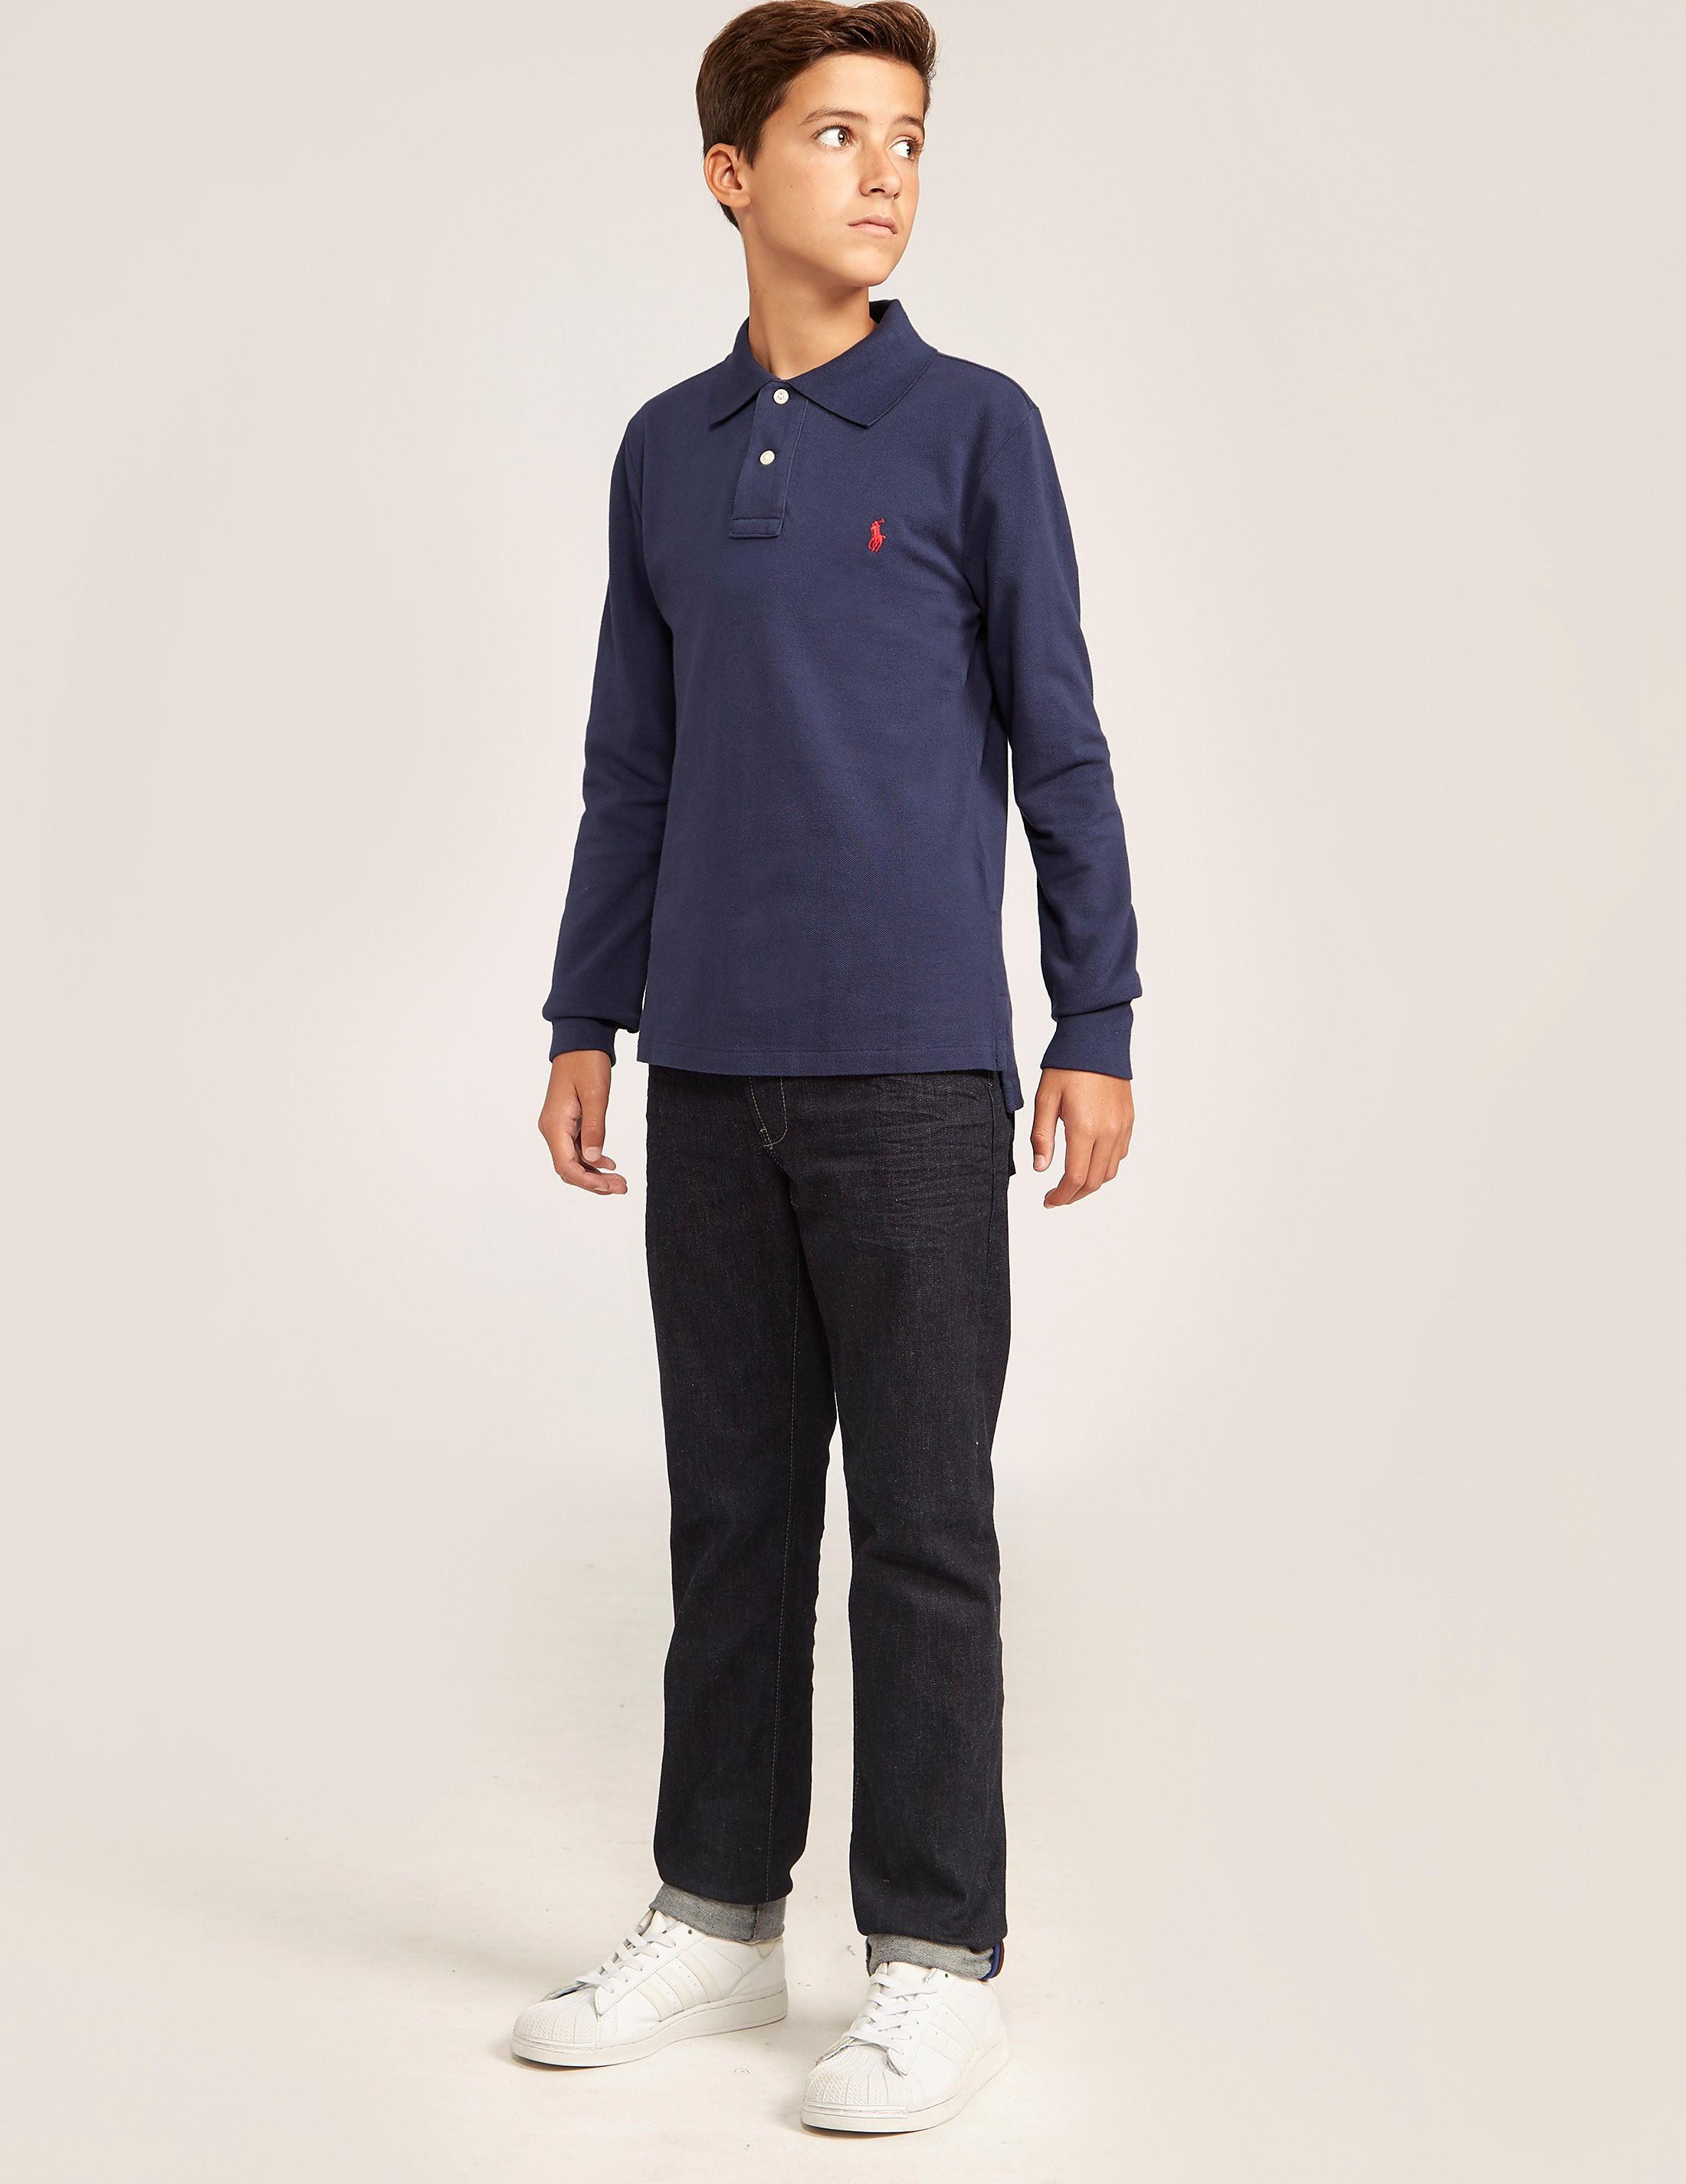 Polo Ralph Lauren Kids' Long Sleeve Pique Polo Shirt